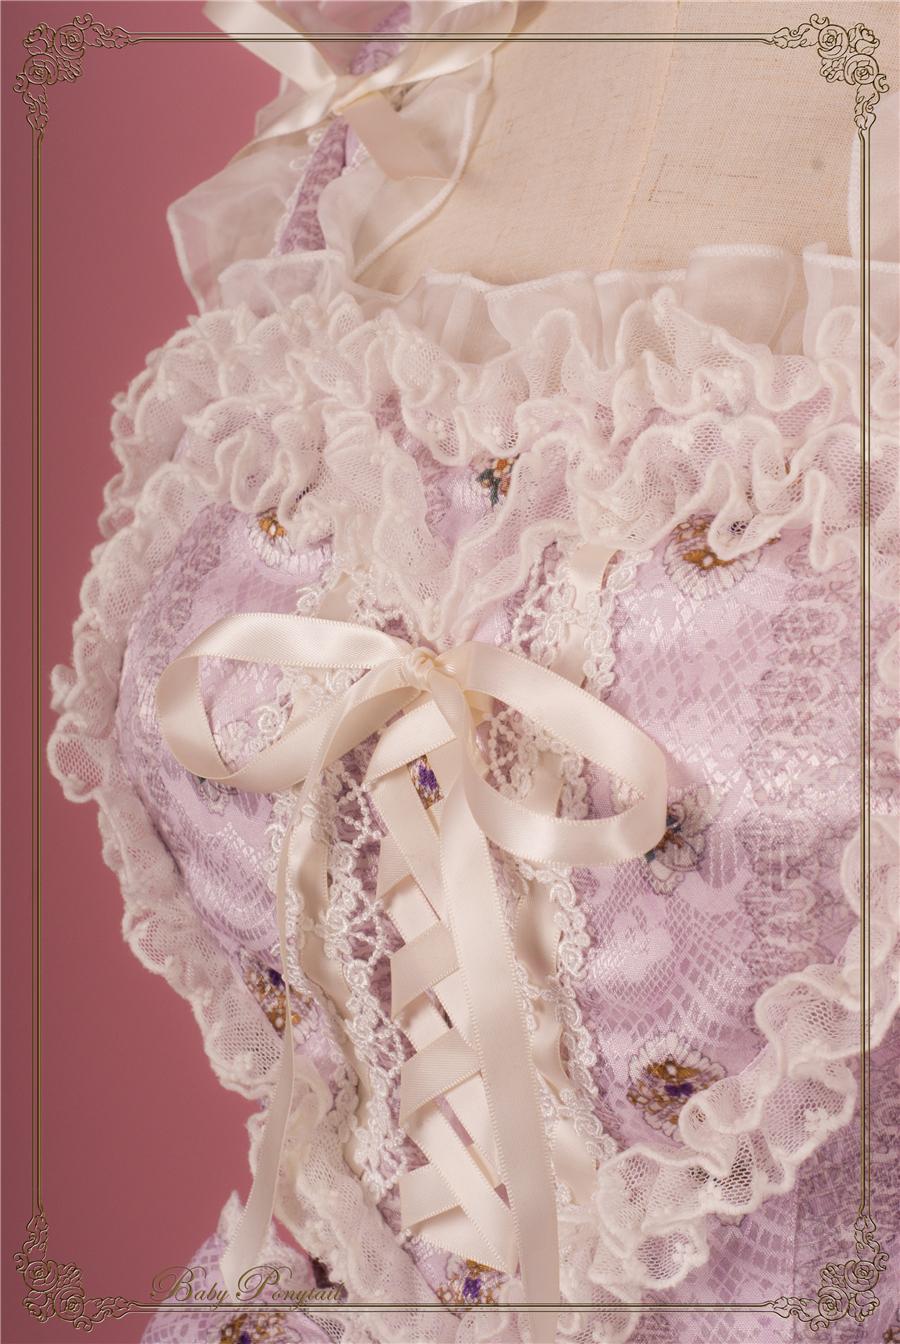 BabyPonytail_Stock Photo_My Favorite Companion_JSK Lavender_7.jpg